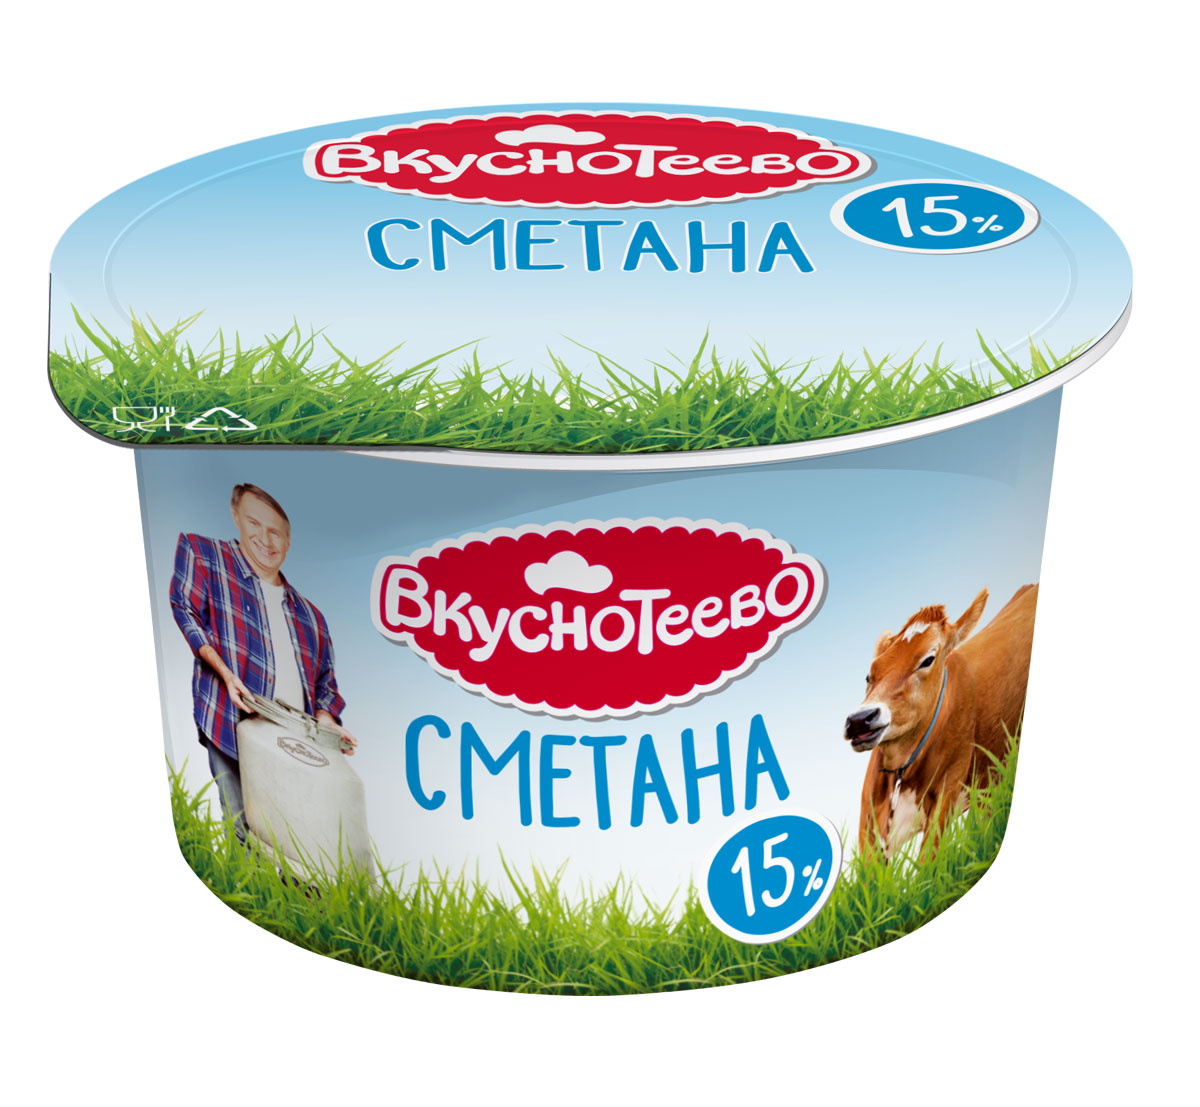 Вкуснотеево Сметана 15%, 150 г конфэшн минутки вафли со вкусом сливок айриш крим 165 г